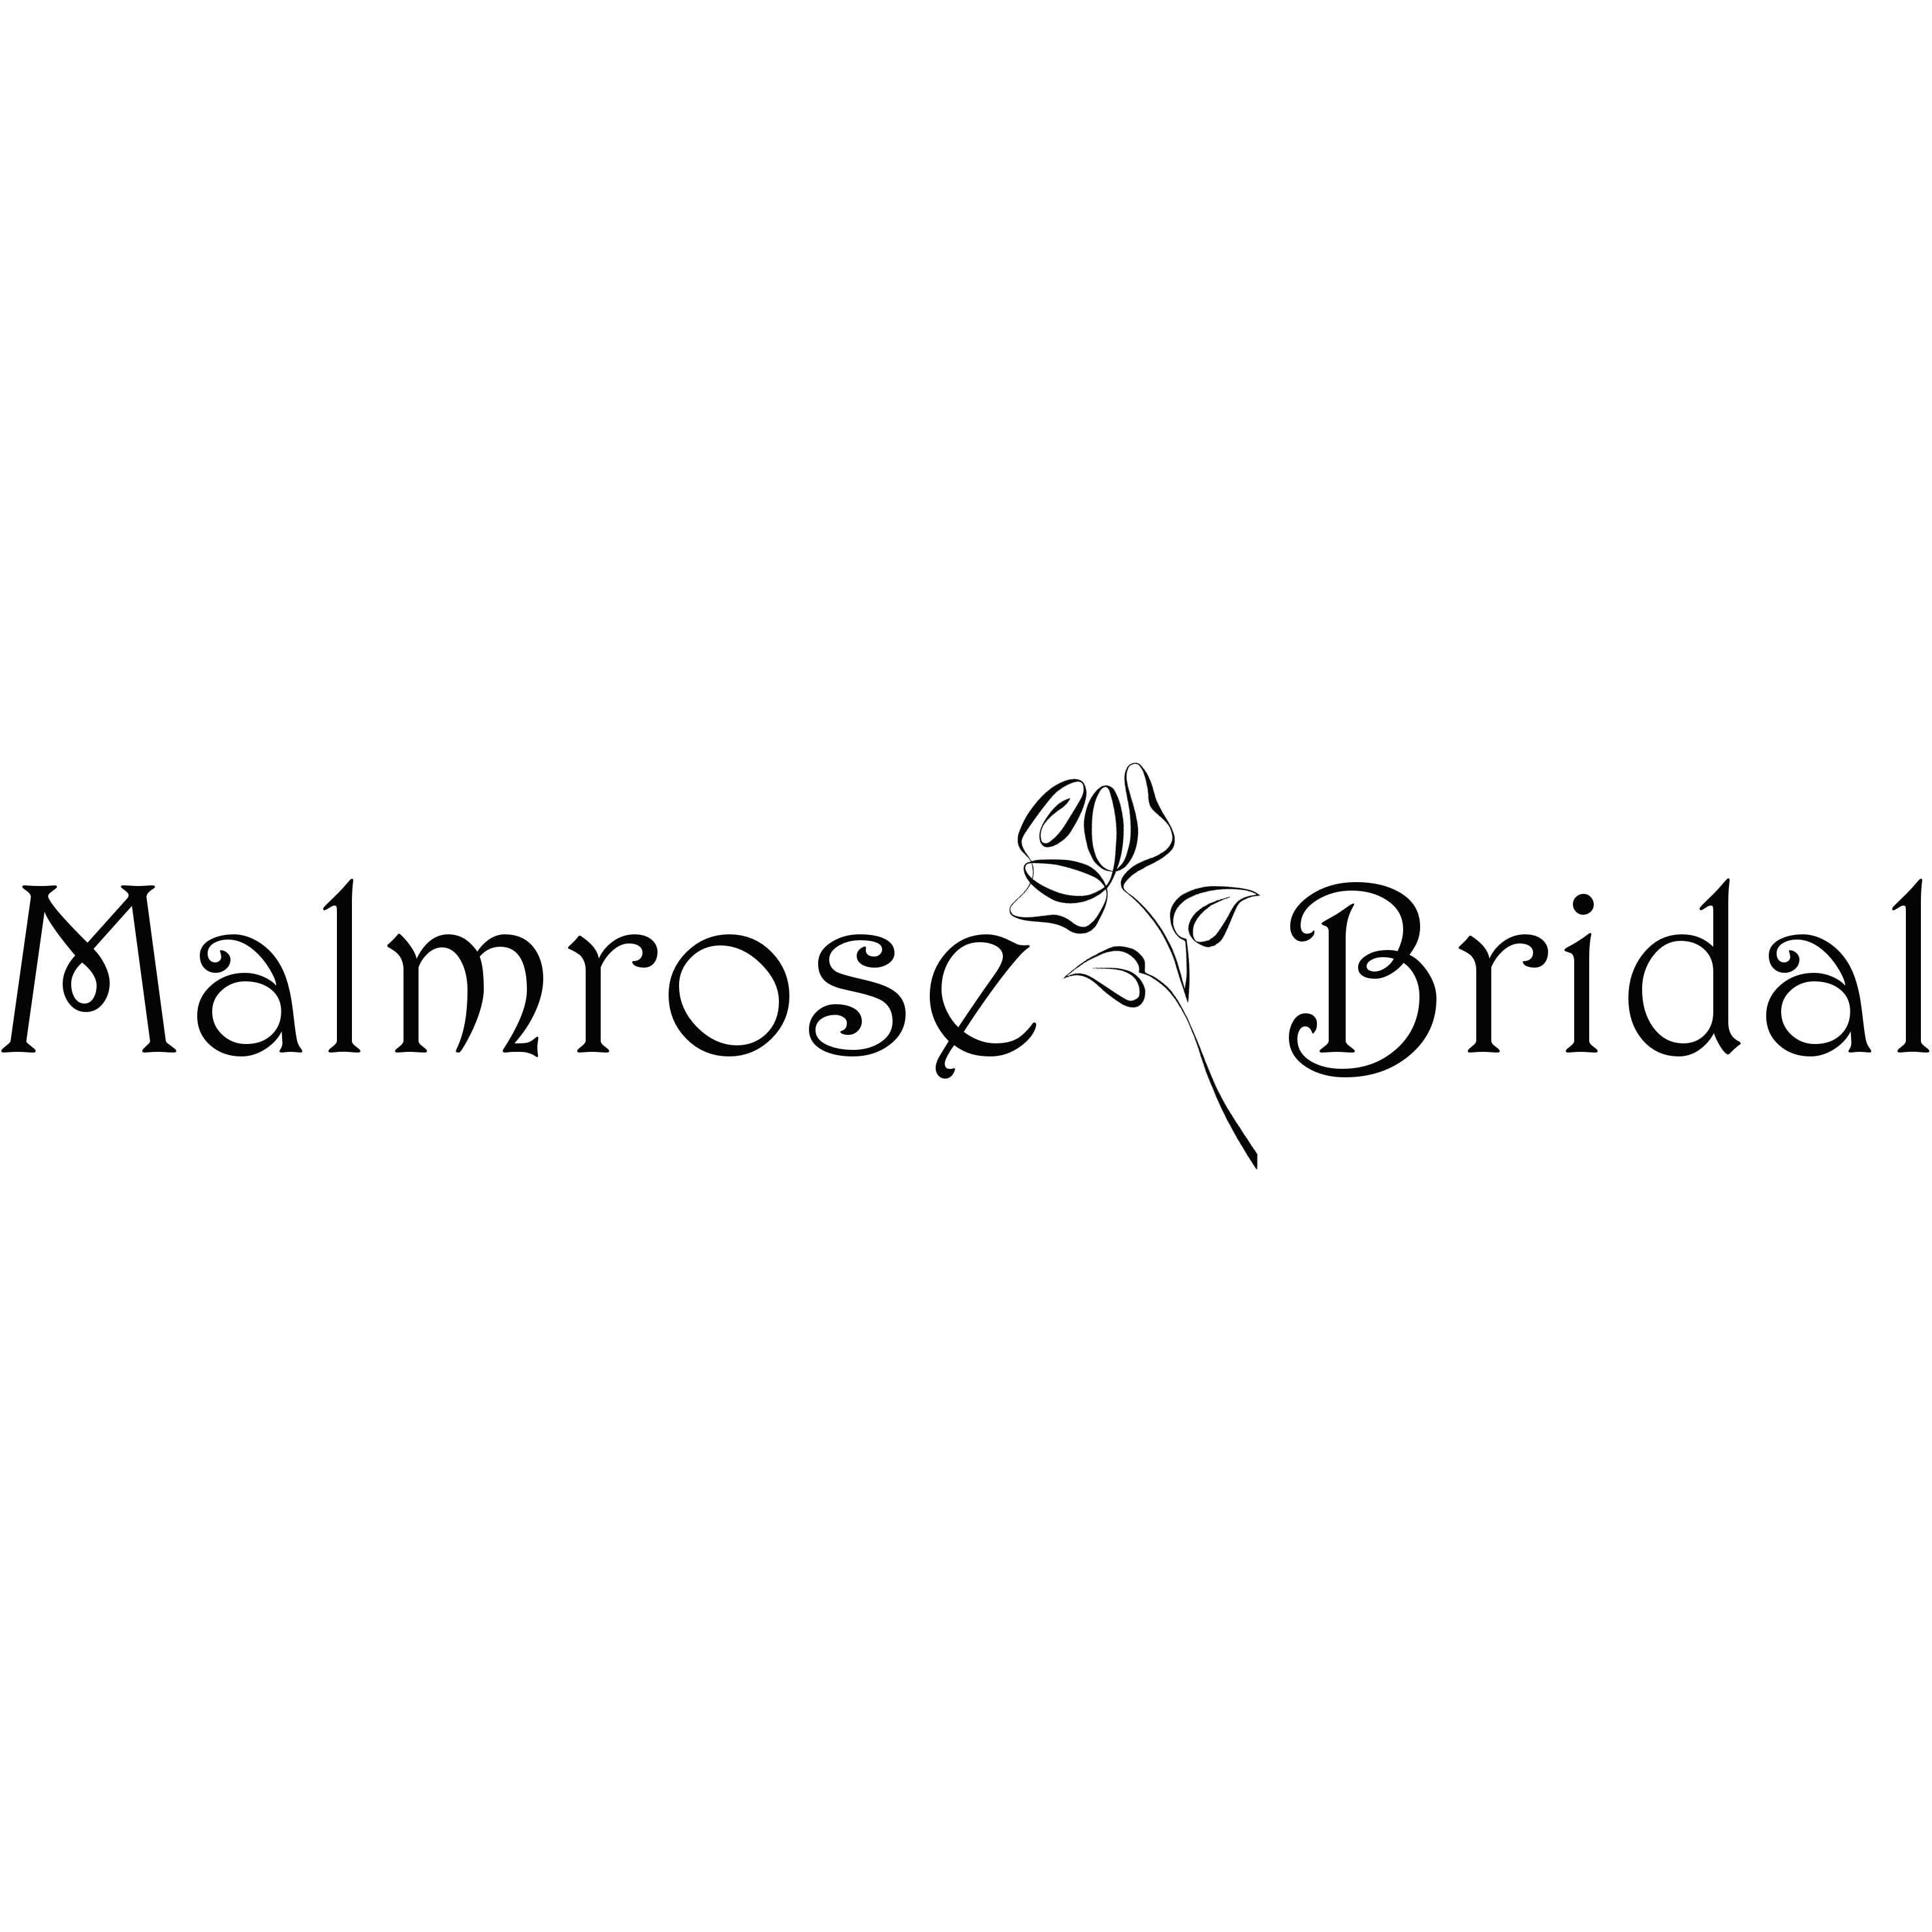 Malmrose Bridal